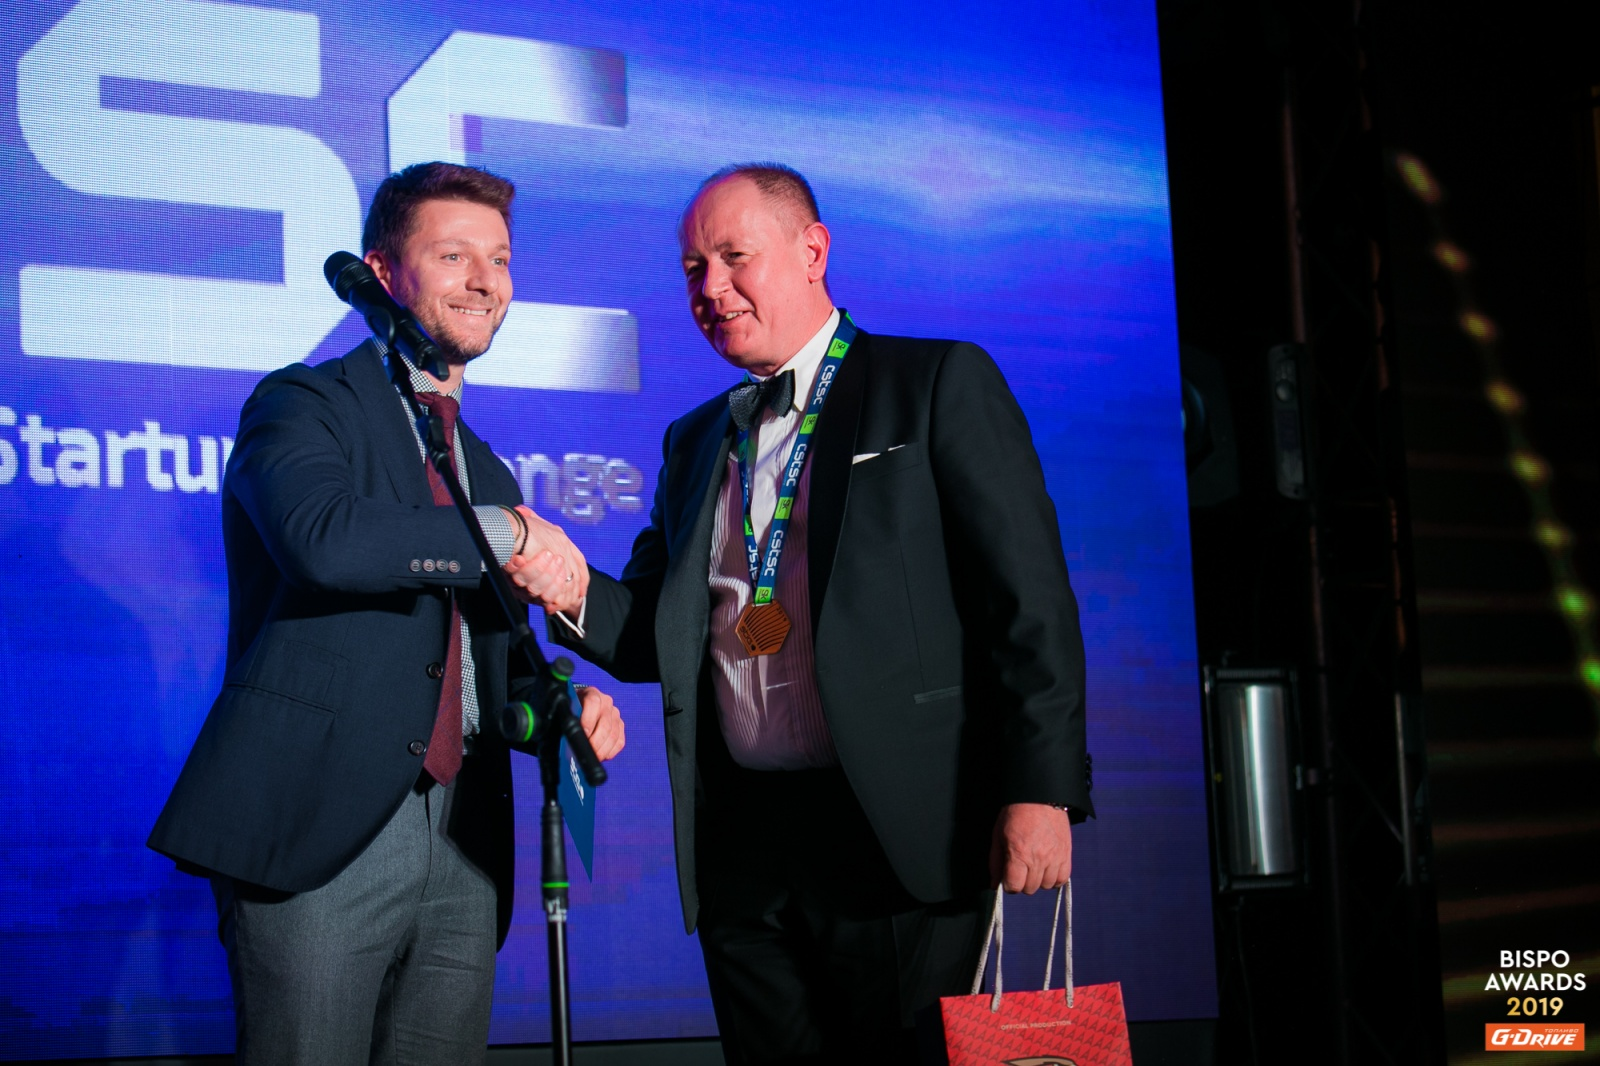 15 наград для спортивно-технологических стартапов на CSTSC от Sports tech innovation group - 2